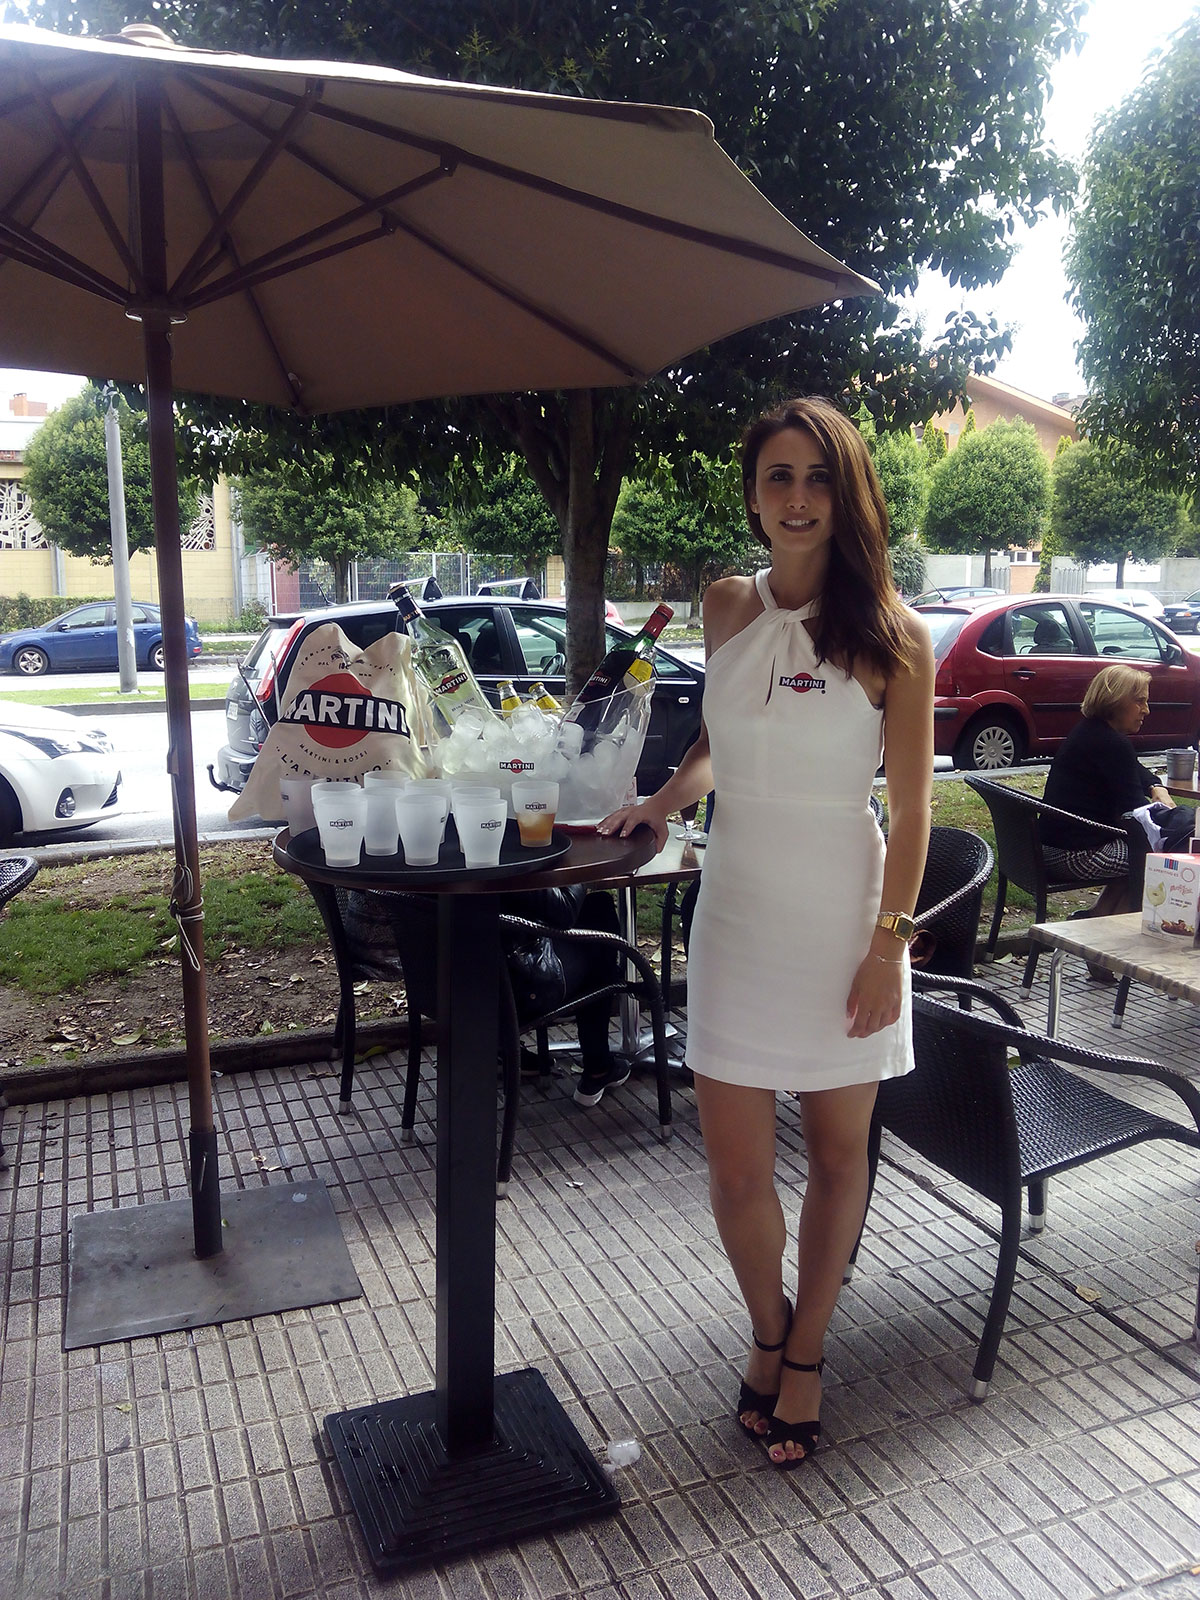 Azafata Martini